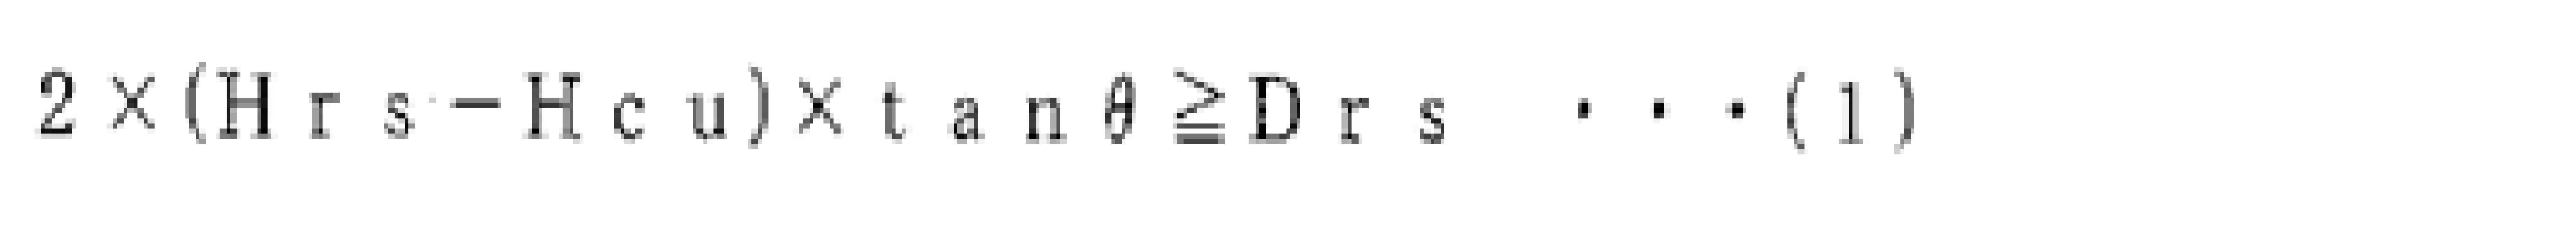 Figure 112019101508504-pct00001